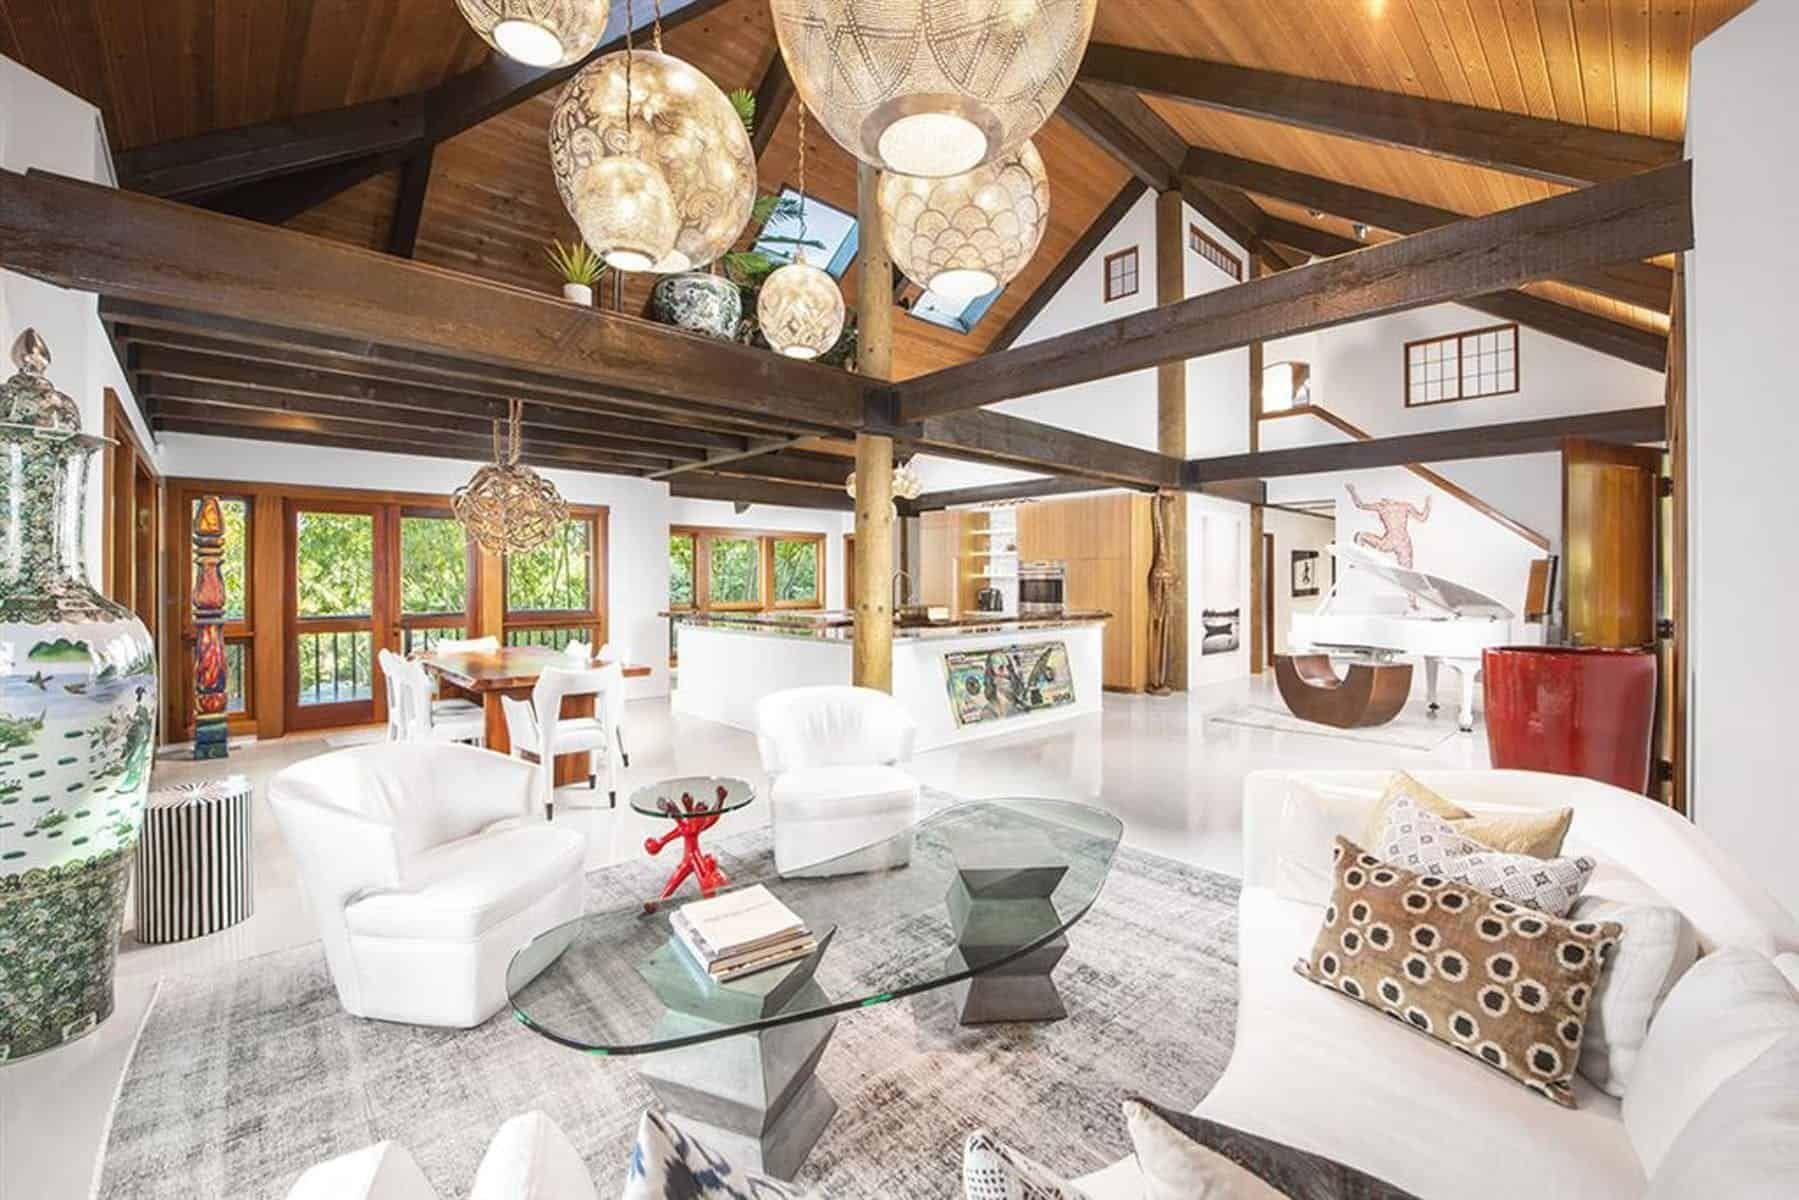 101 Asian Living Room Ideas (Photos) in 2020 | Asian ...